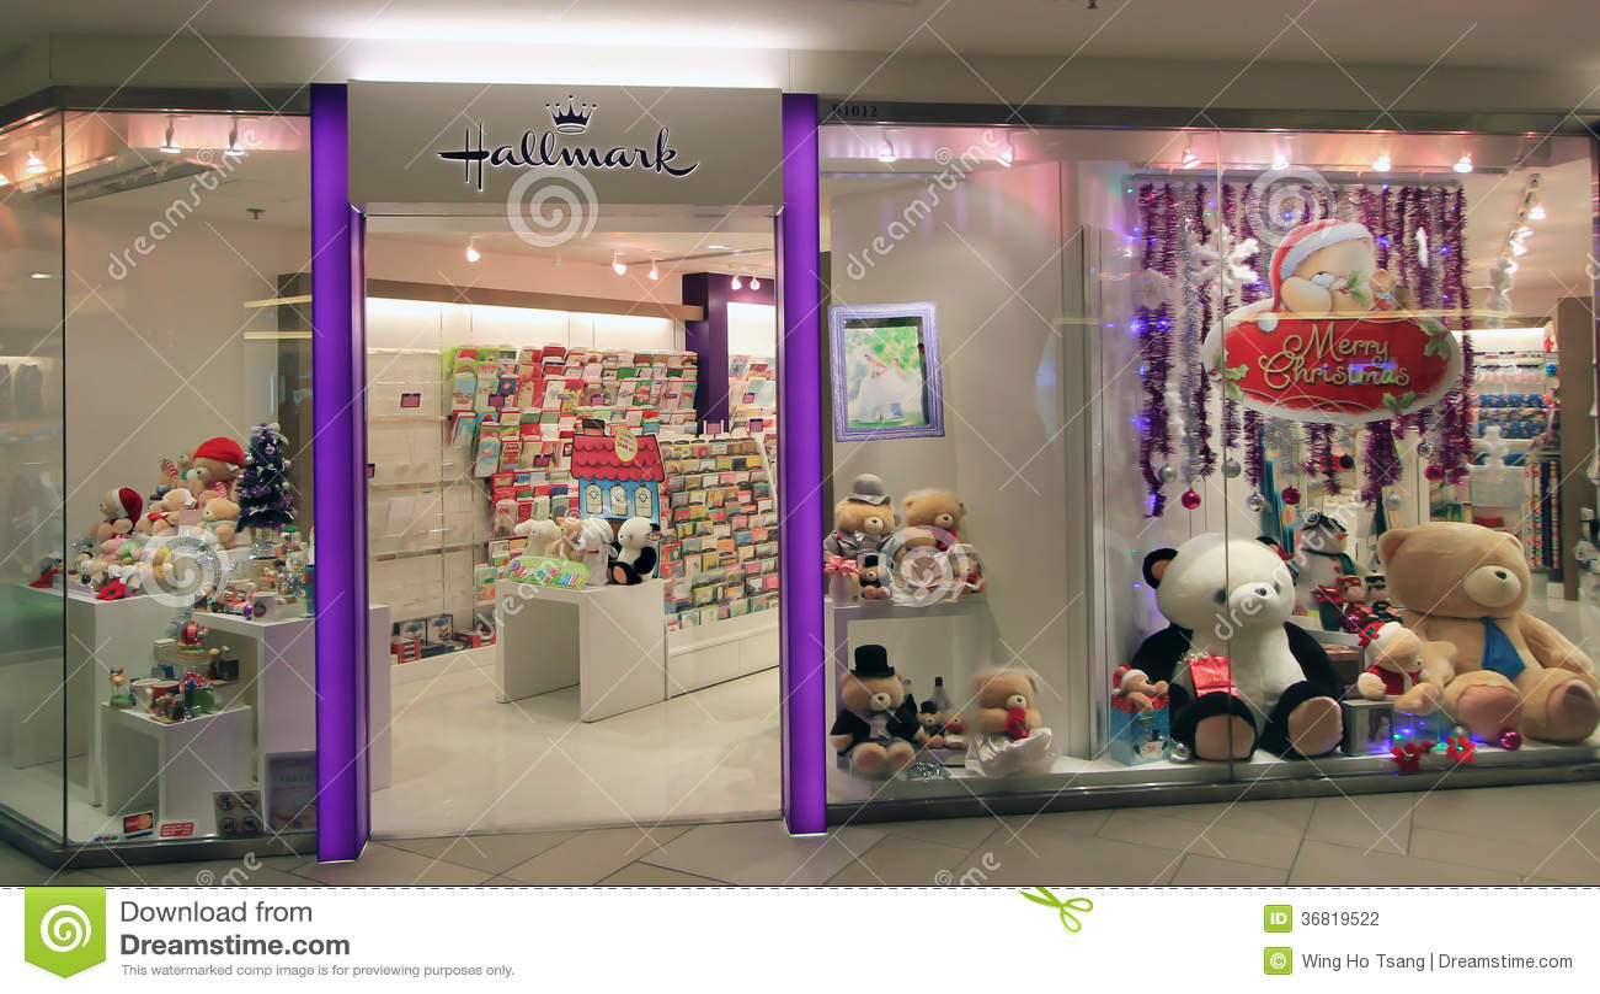 Hallmark Shop In Hong Kong Editorial Photography Image